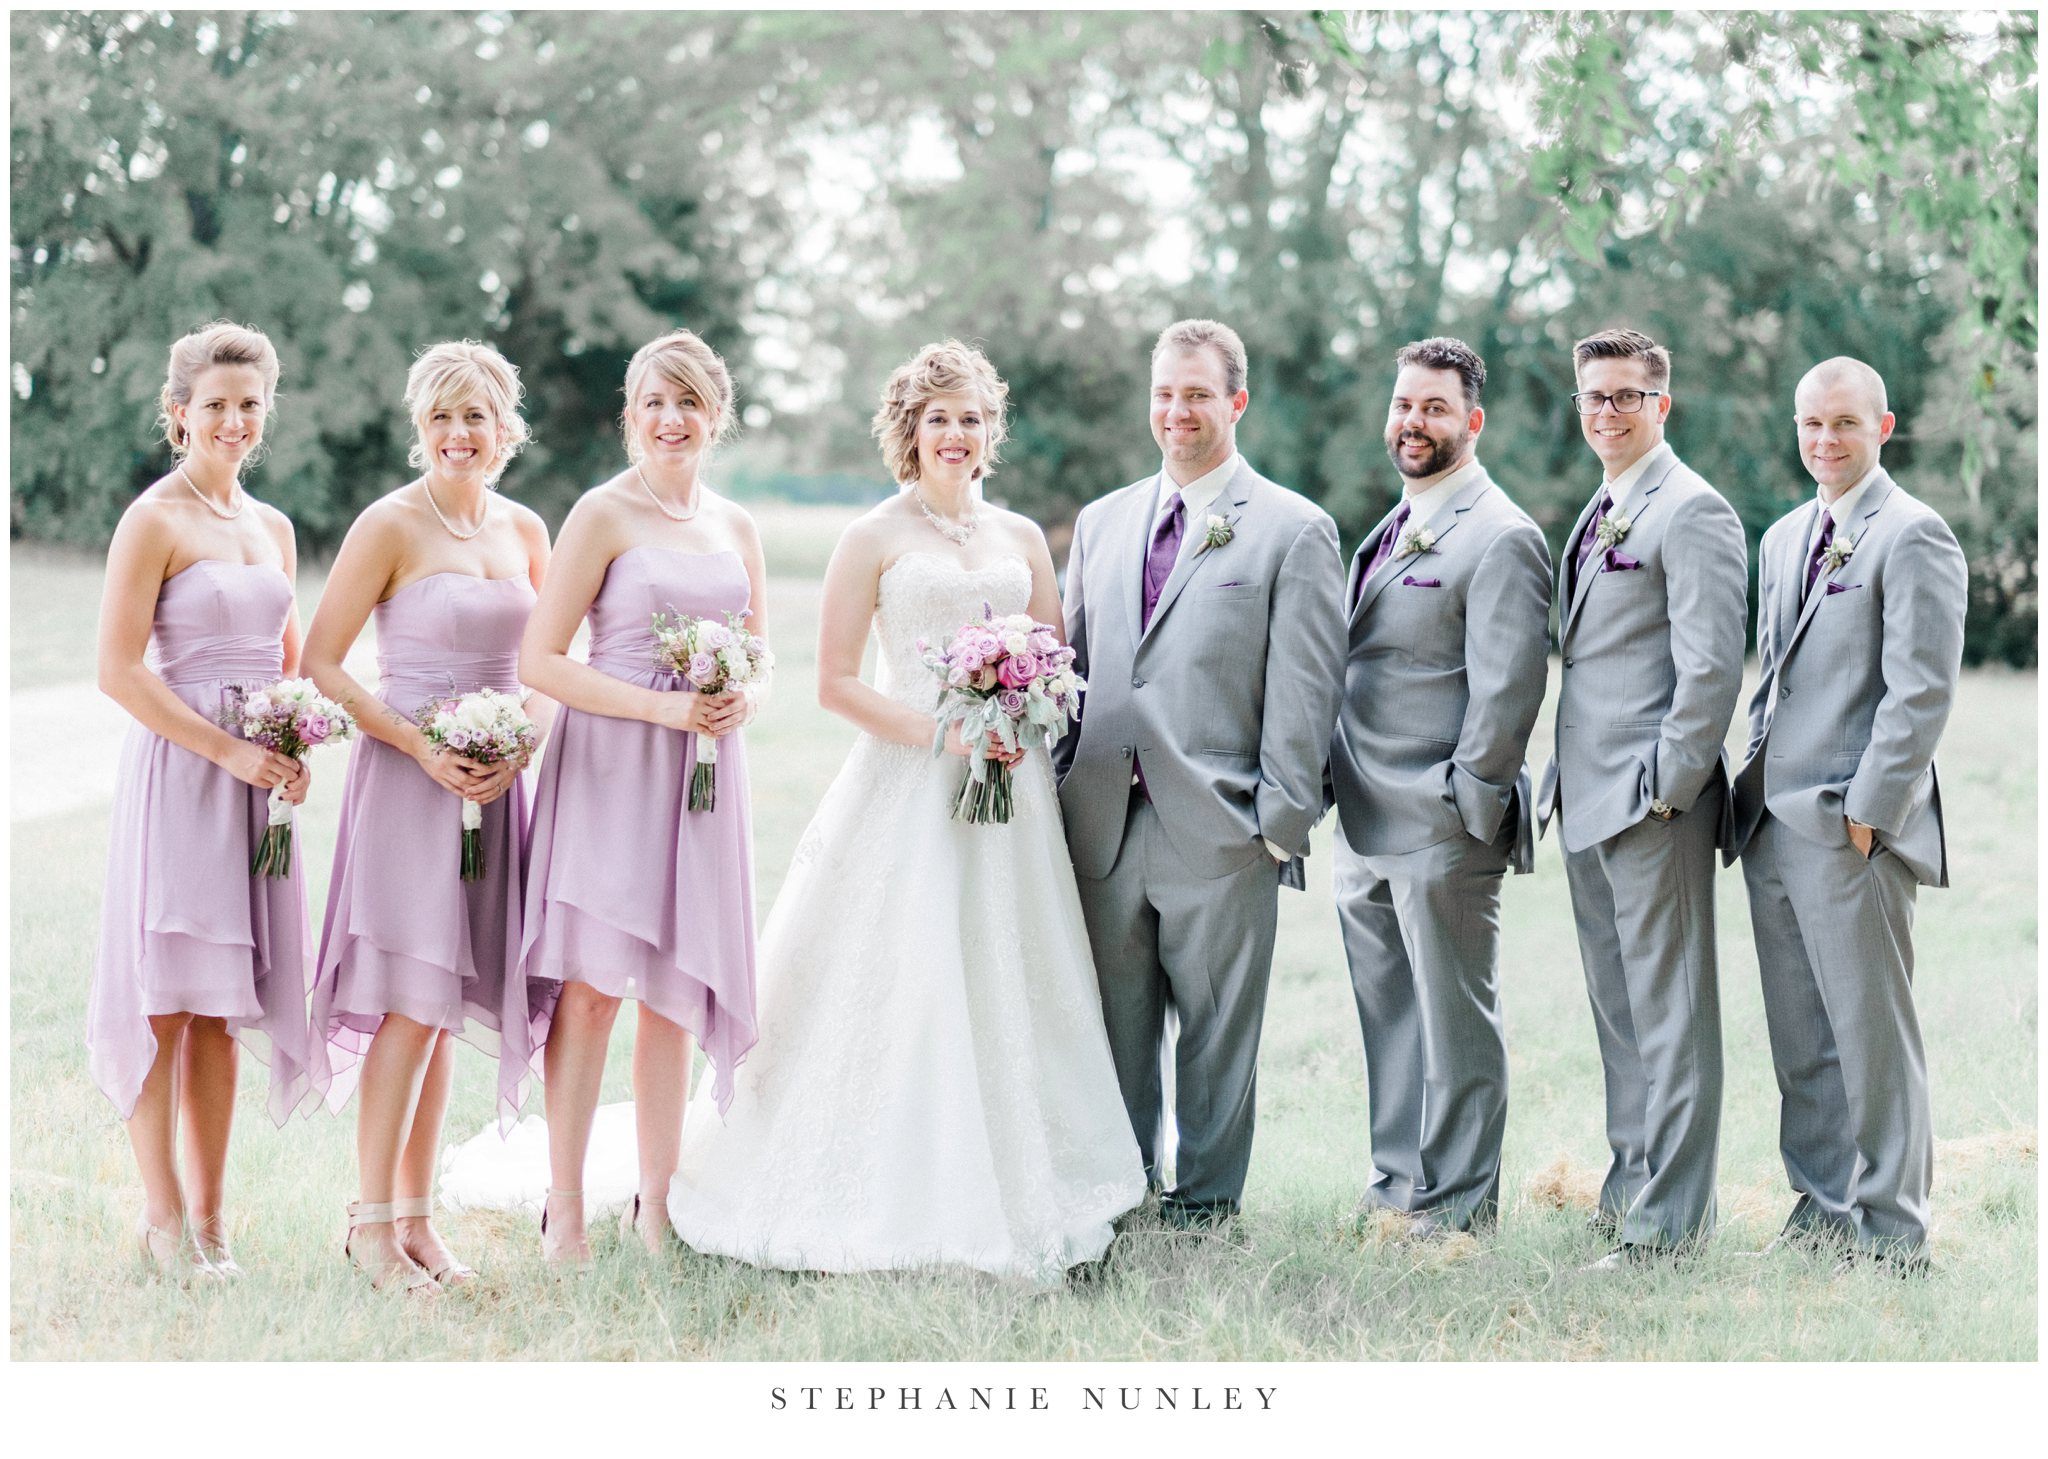 southern-classy-outdoor-barn-wedding-photos-0065.jpg